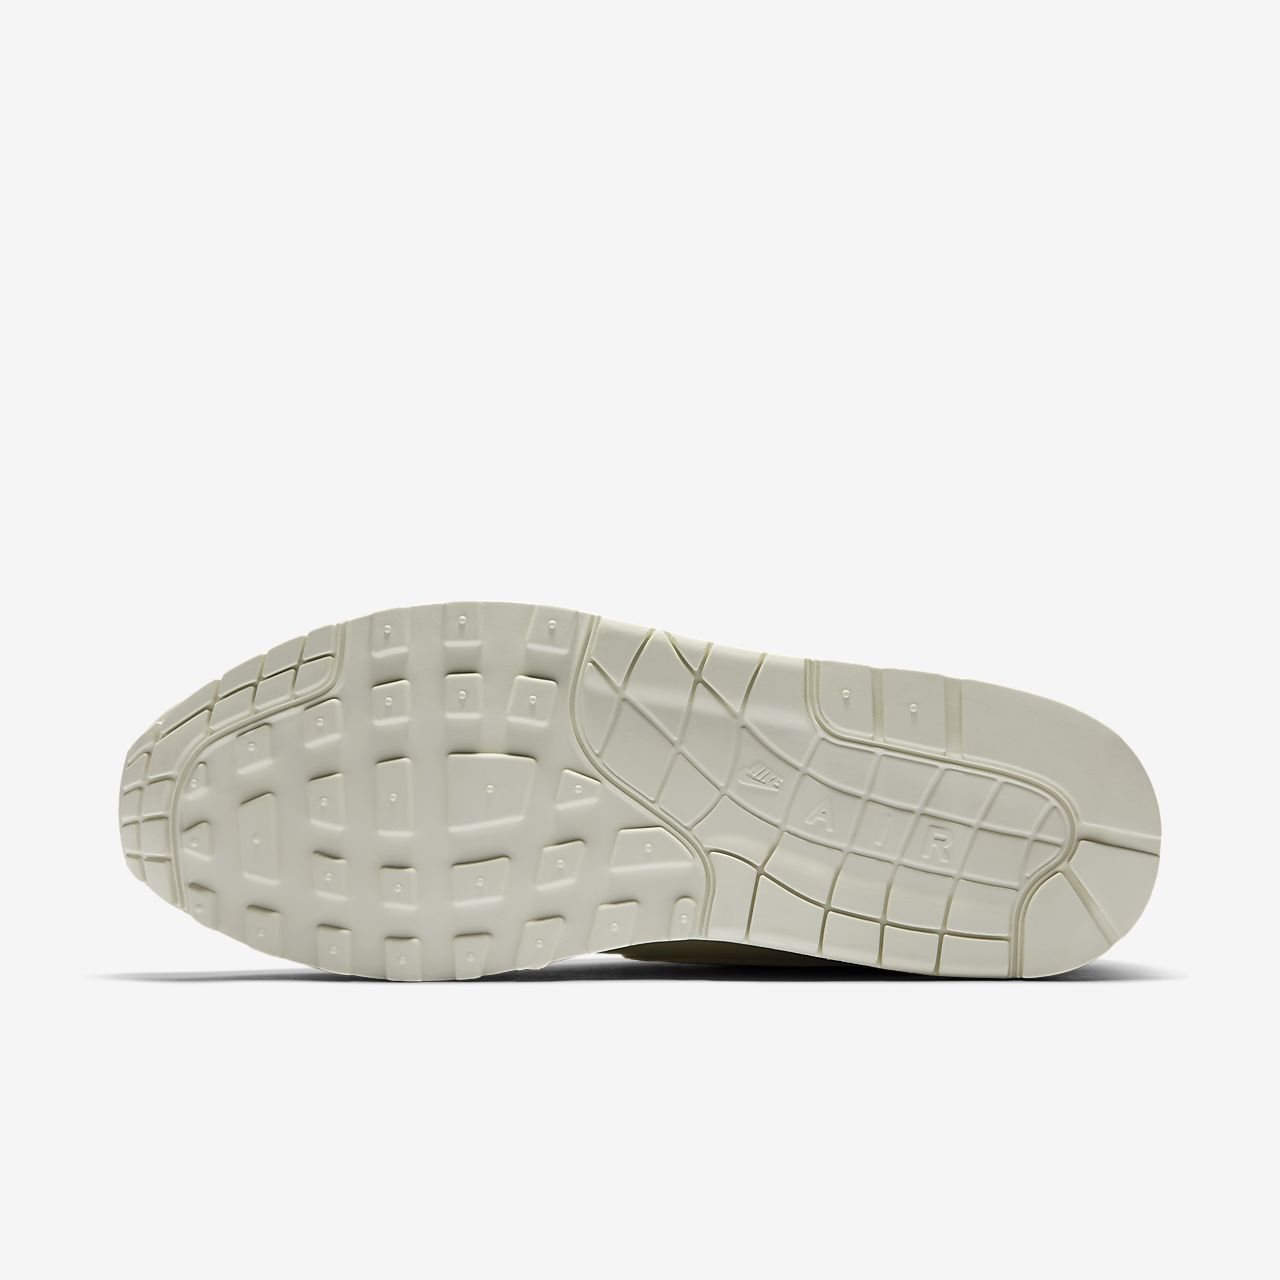 6741bb965dce Nike Air Max 1 Pinnacle Men s Shoe. Nike.com ZA